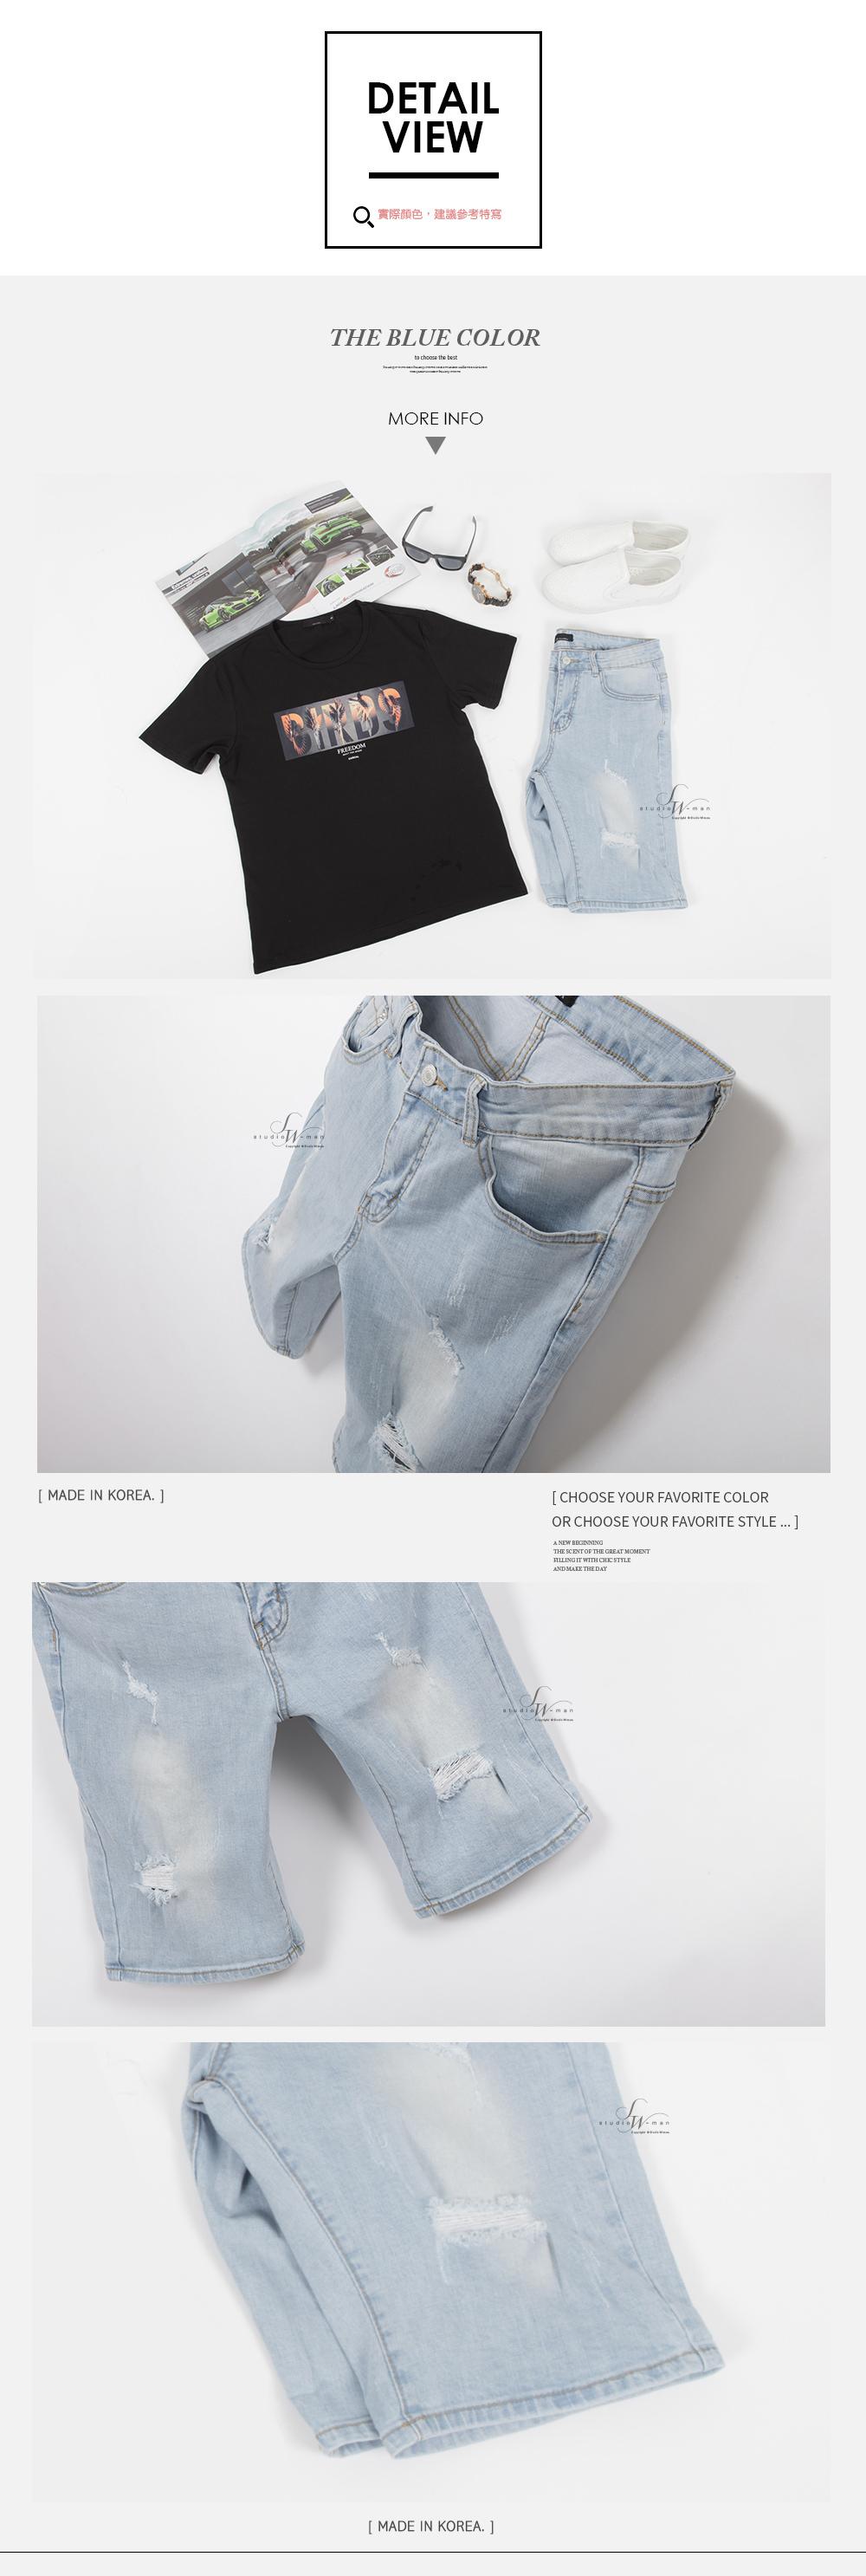 。SW。【K91697】正韓PES 淺藍刷紋 抽鬚破壞 褲頭有彈性 彈性單寧布 窄身 牛仔短褲 韓國製 英倫 GD